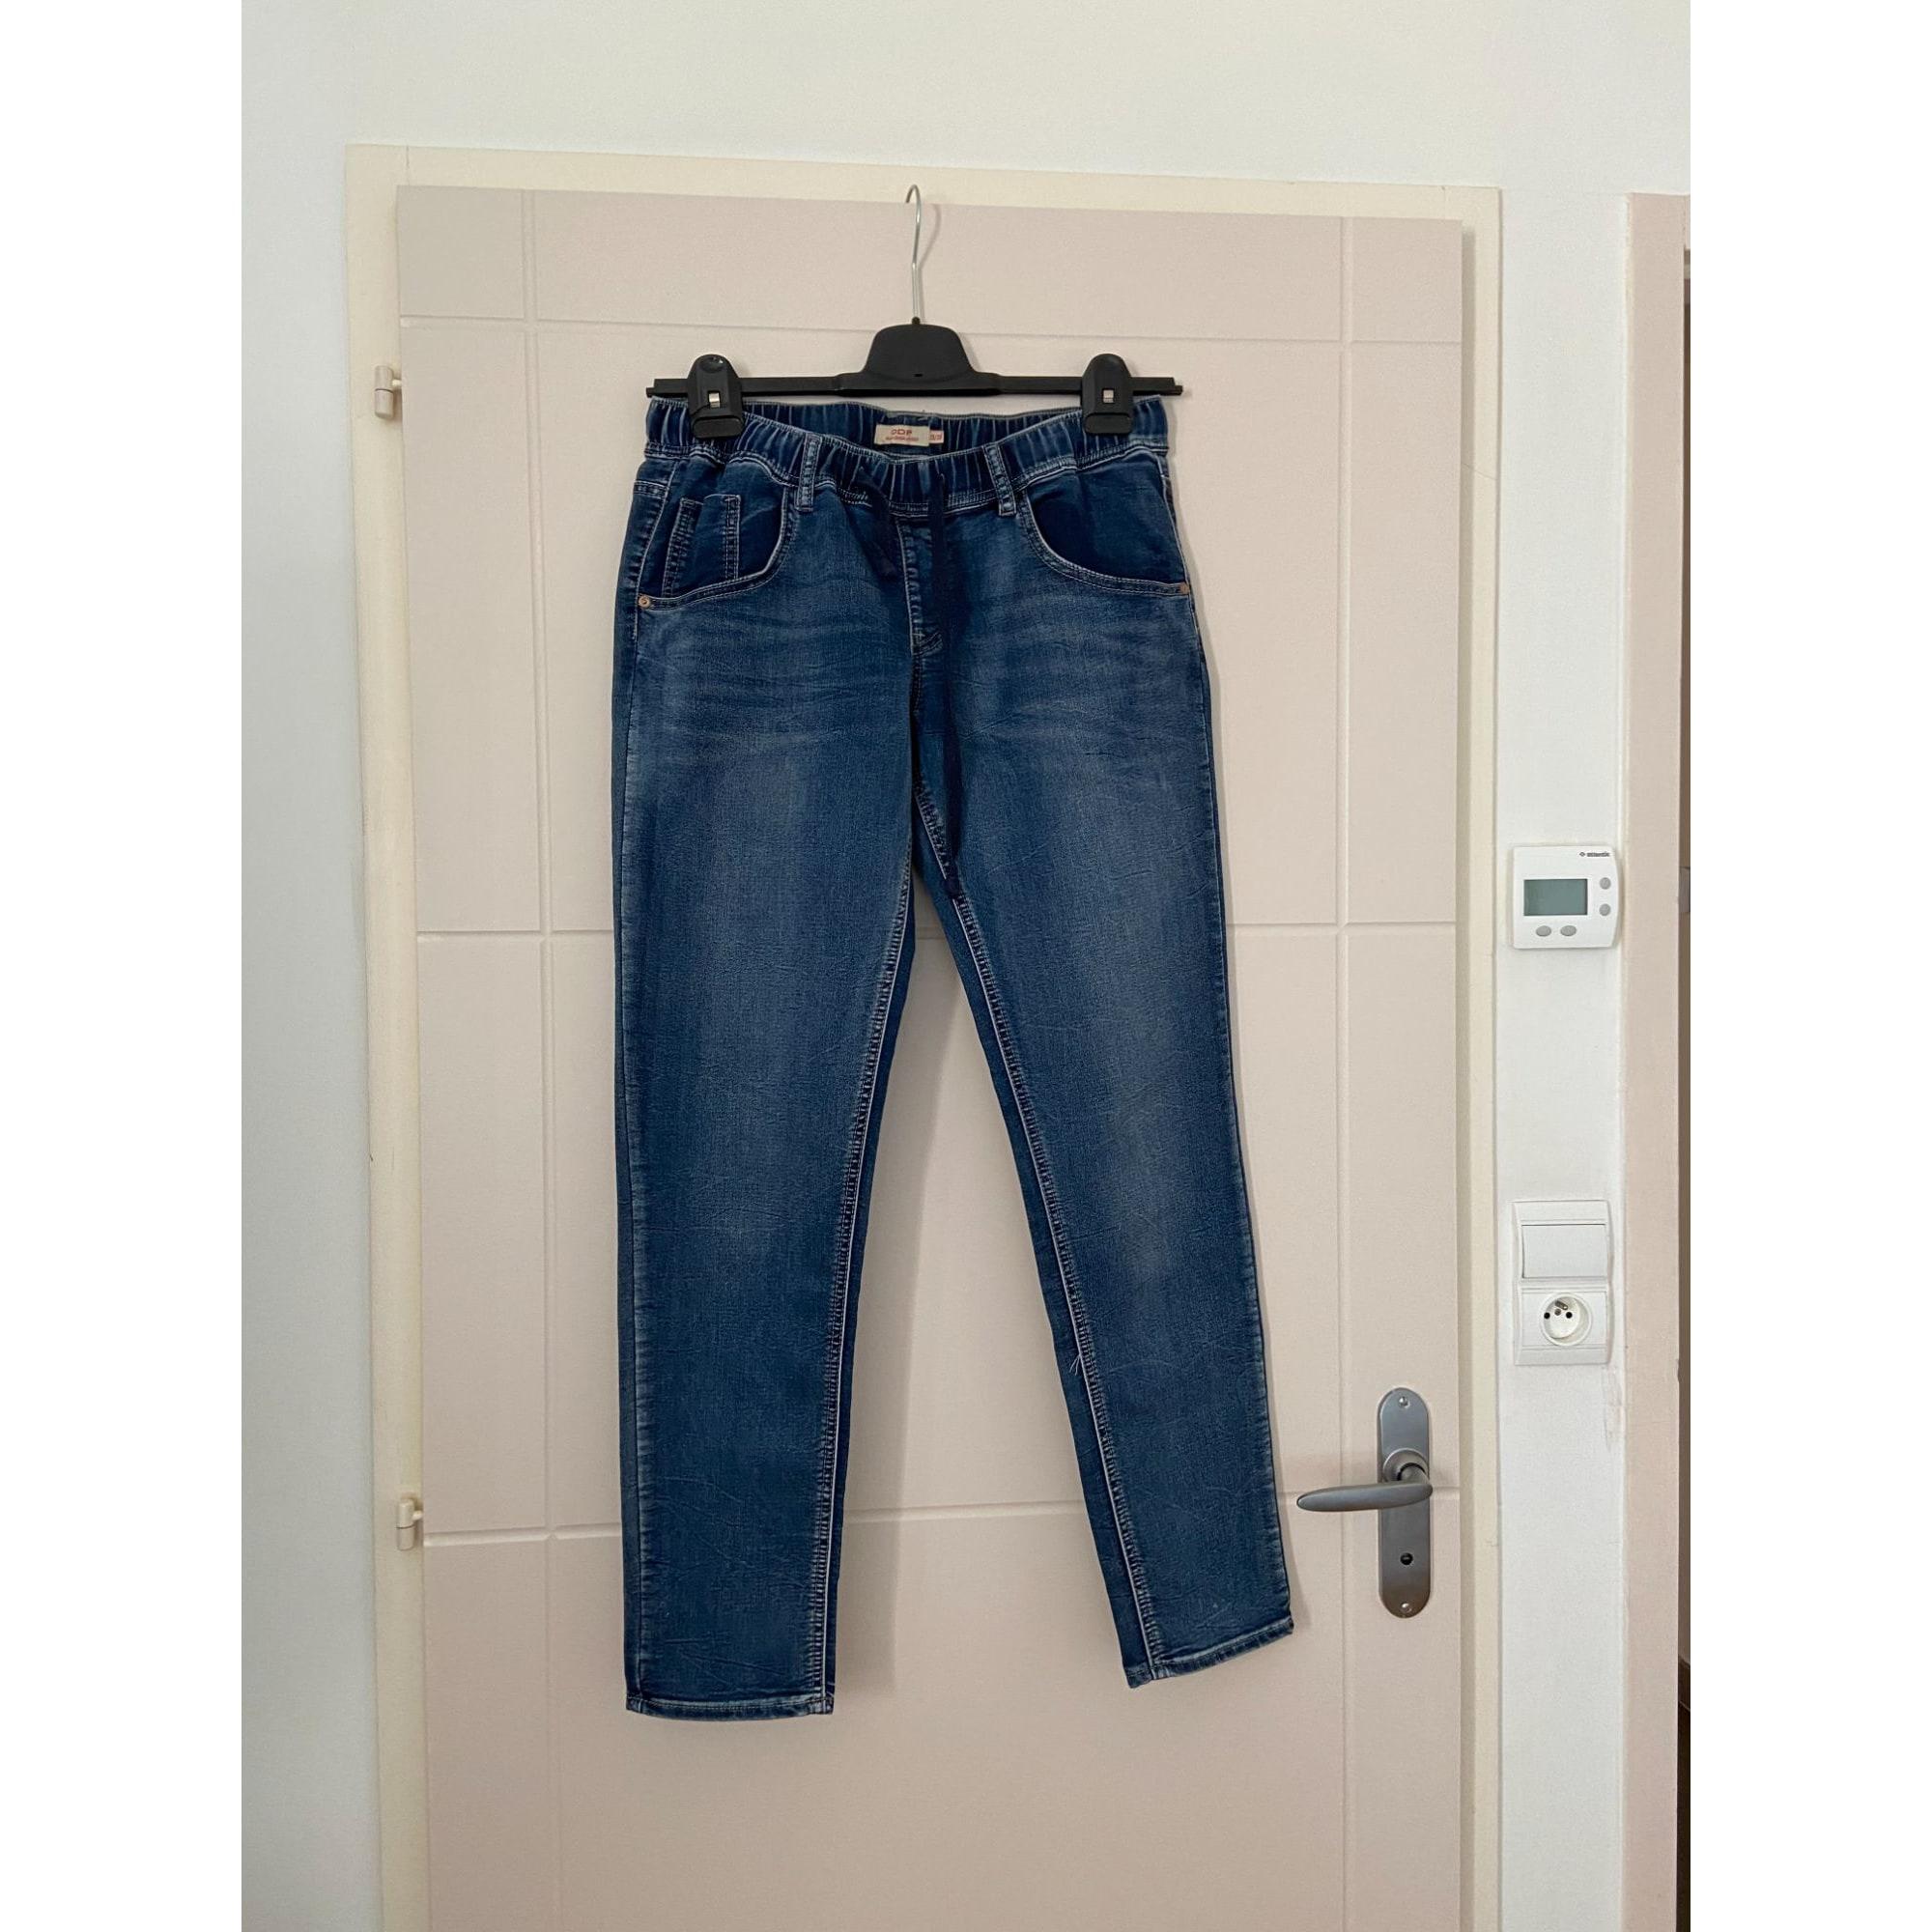 Jeans droit DDP Bleu, bleu marine, bleu turquoise